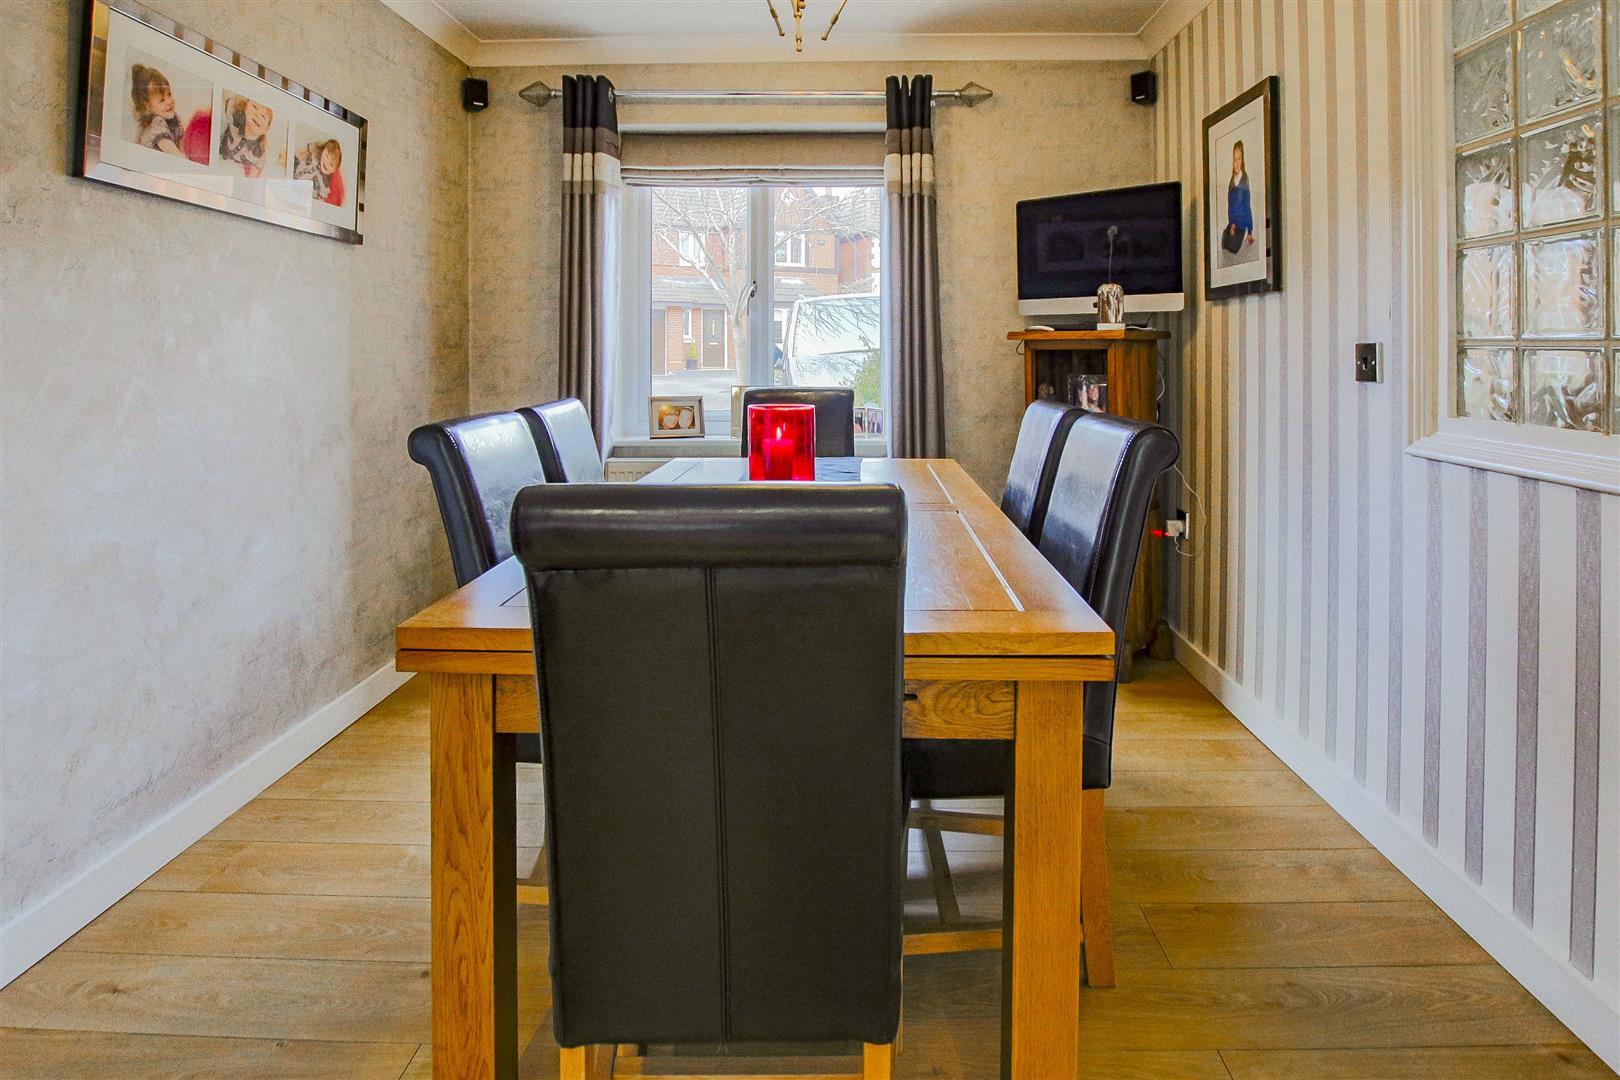 4 Bedroom Detached House For Sale - redwing31761.JPG